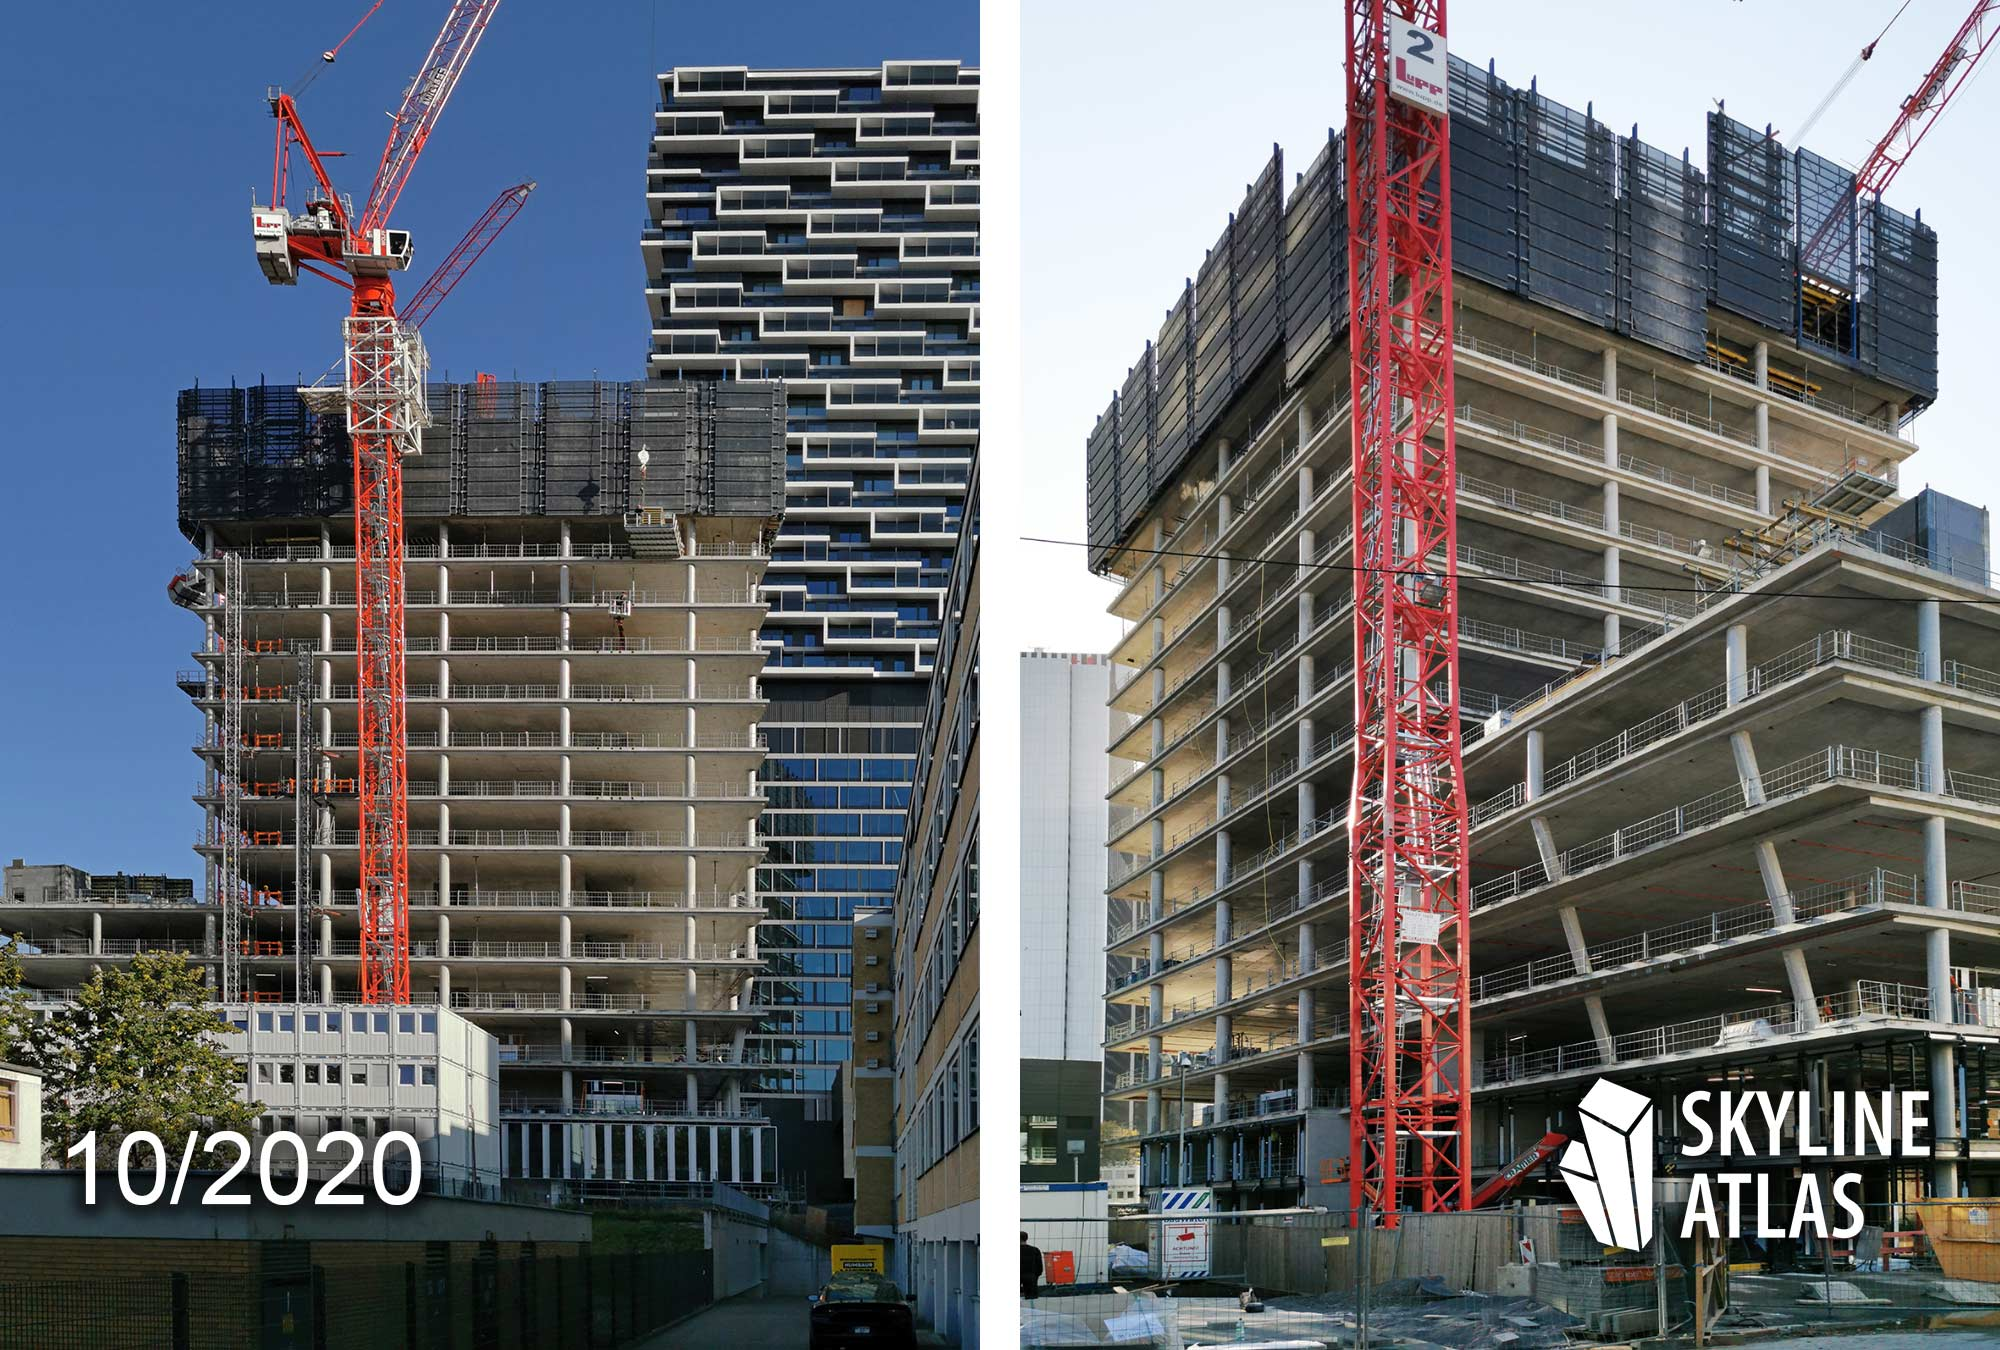 Senckenberg Turm Frankfurt - 99 West - Ninty Nine West - Baustelle Oktober 2020